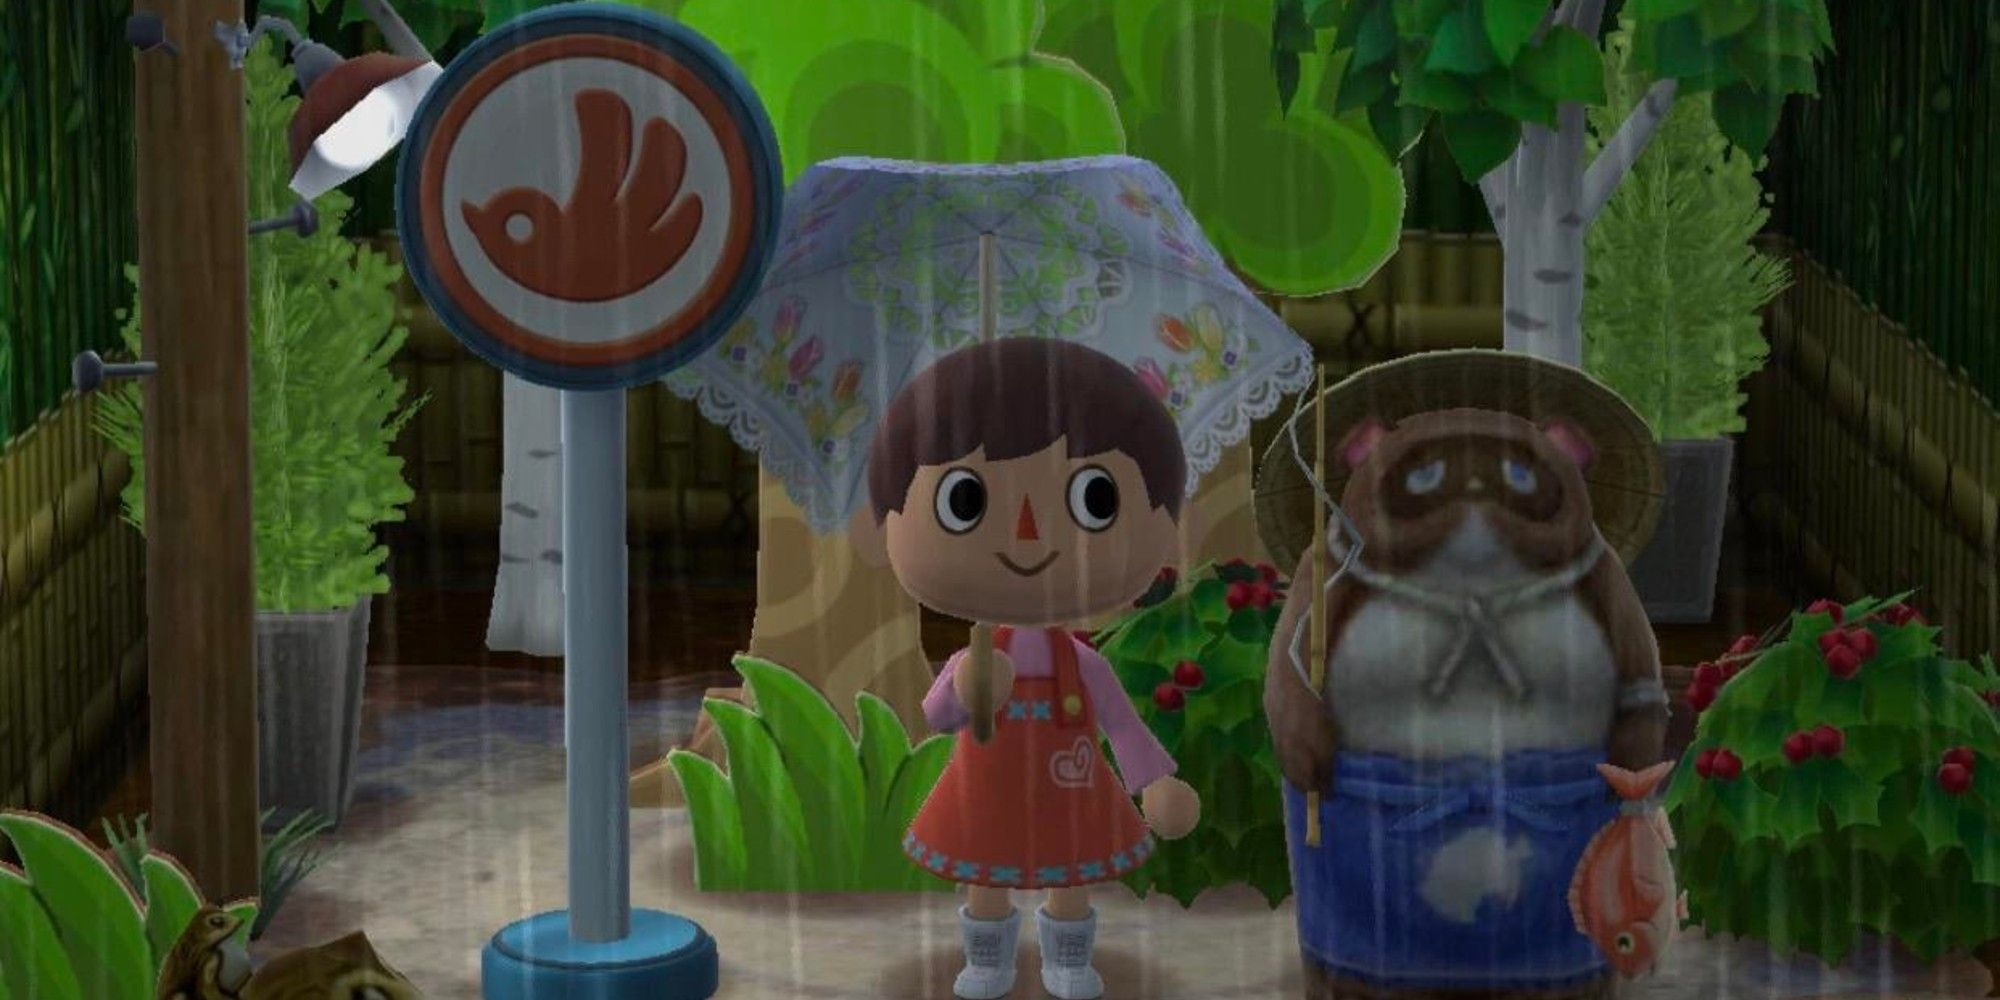 Totoro Inspired Design Ideas Tips In Animal Crossing New Horizons